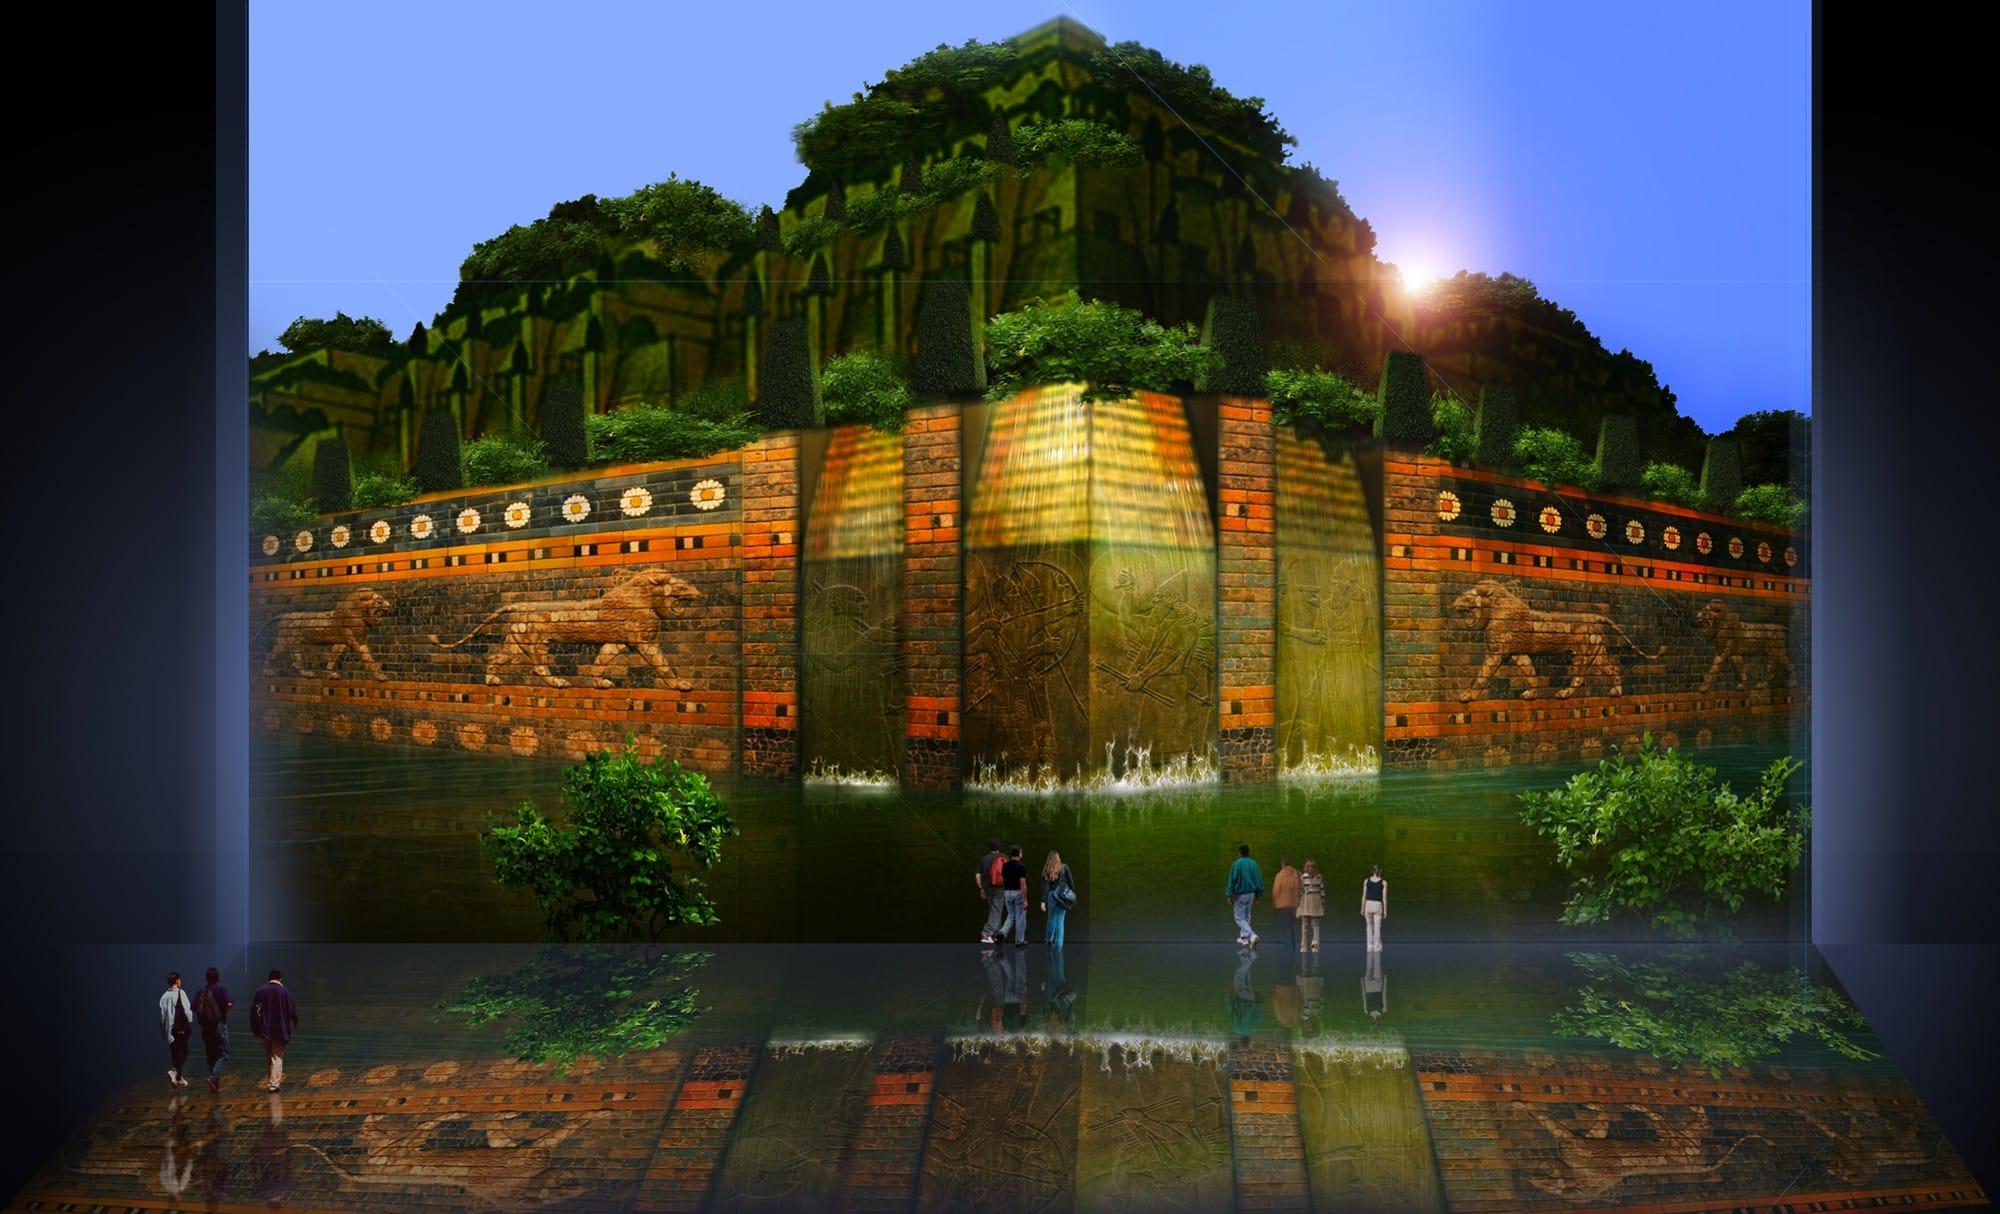 jardines colgantes de babilonia the